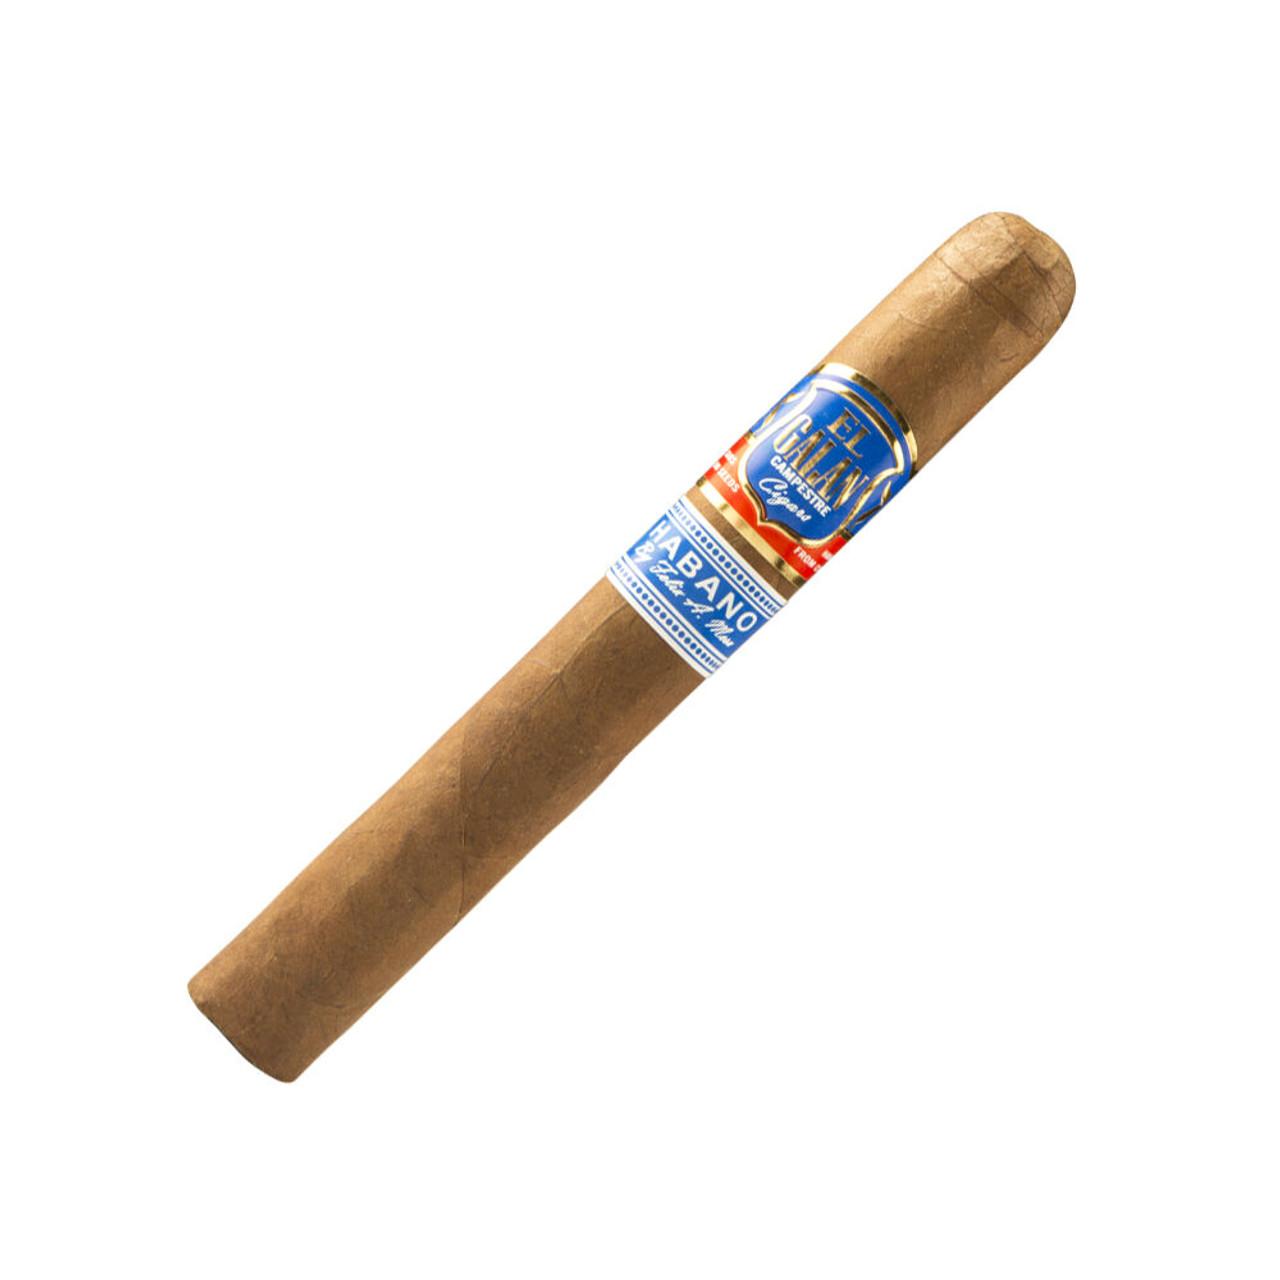 El Galan Campestre Toro Cigars - 6 x 52 (Bundle of 20)